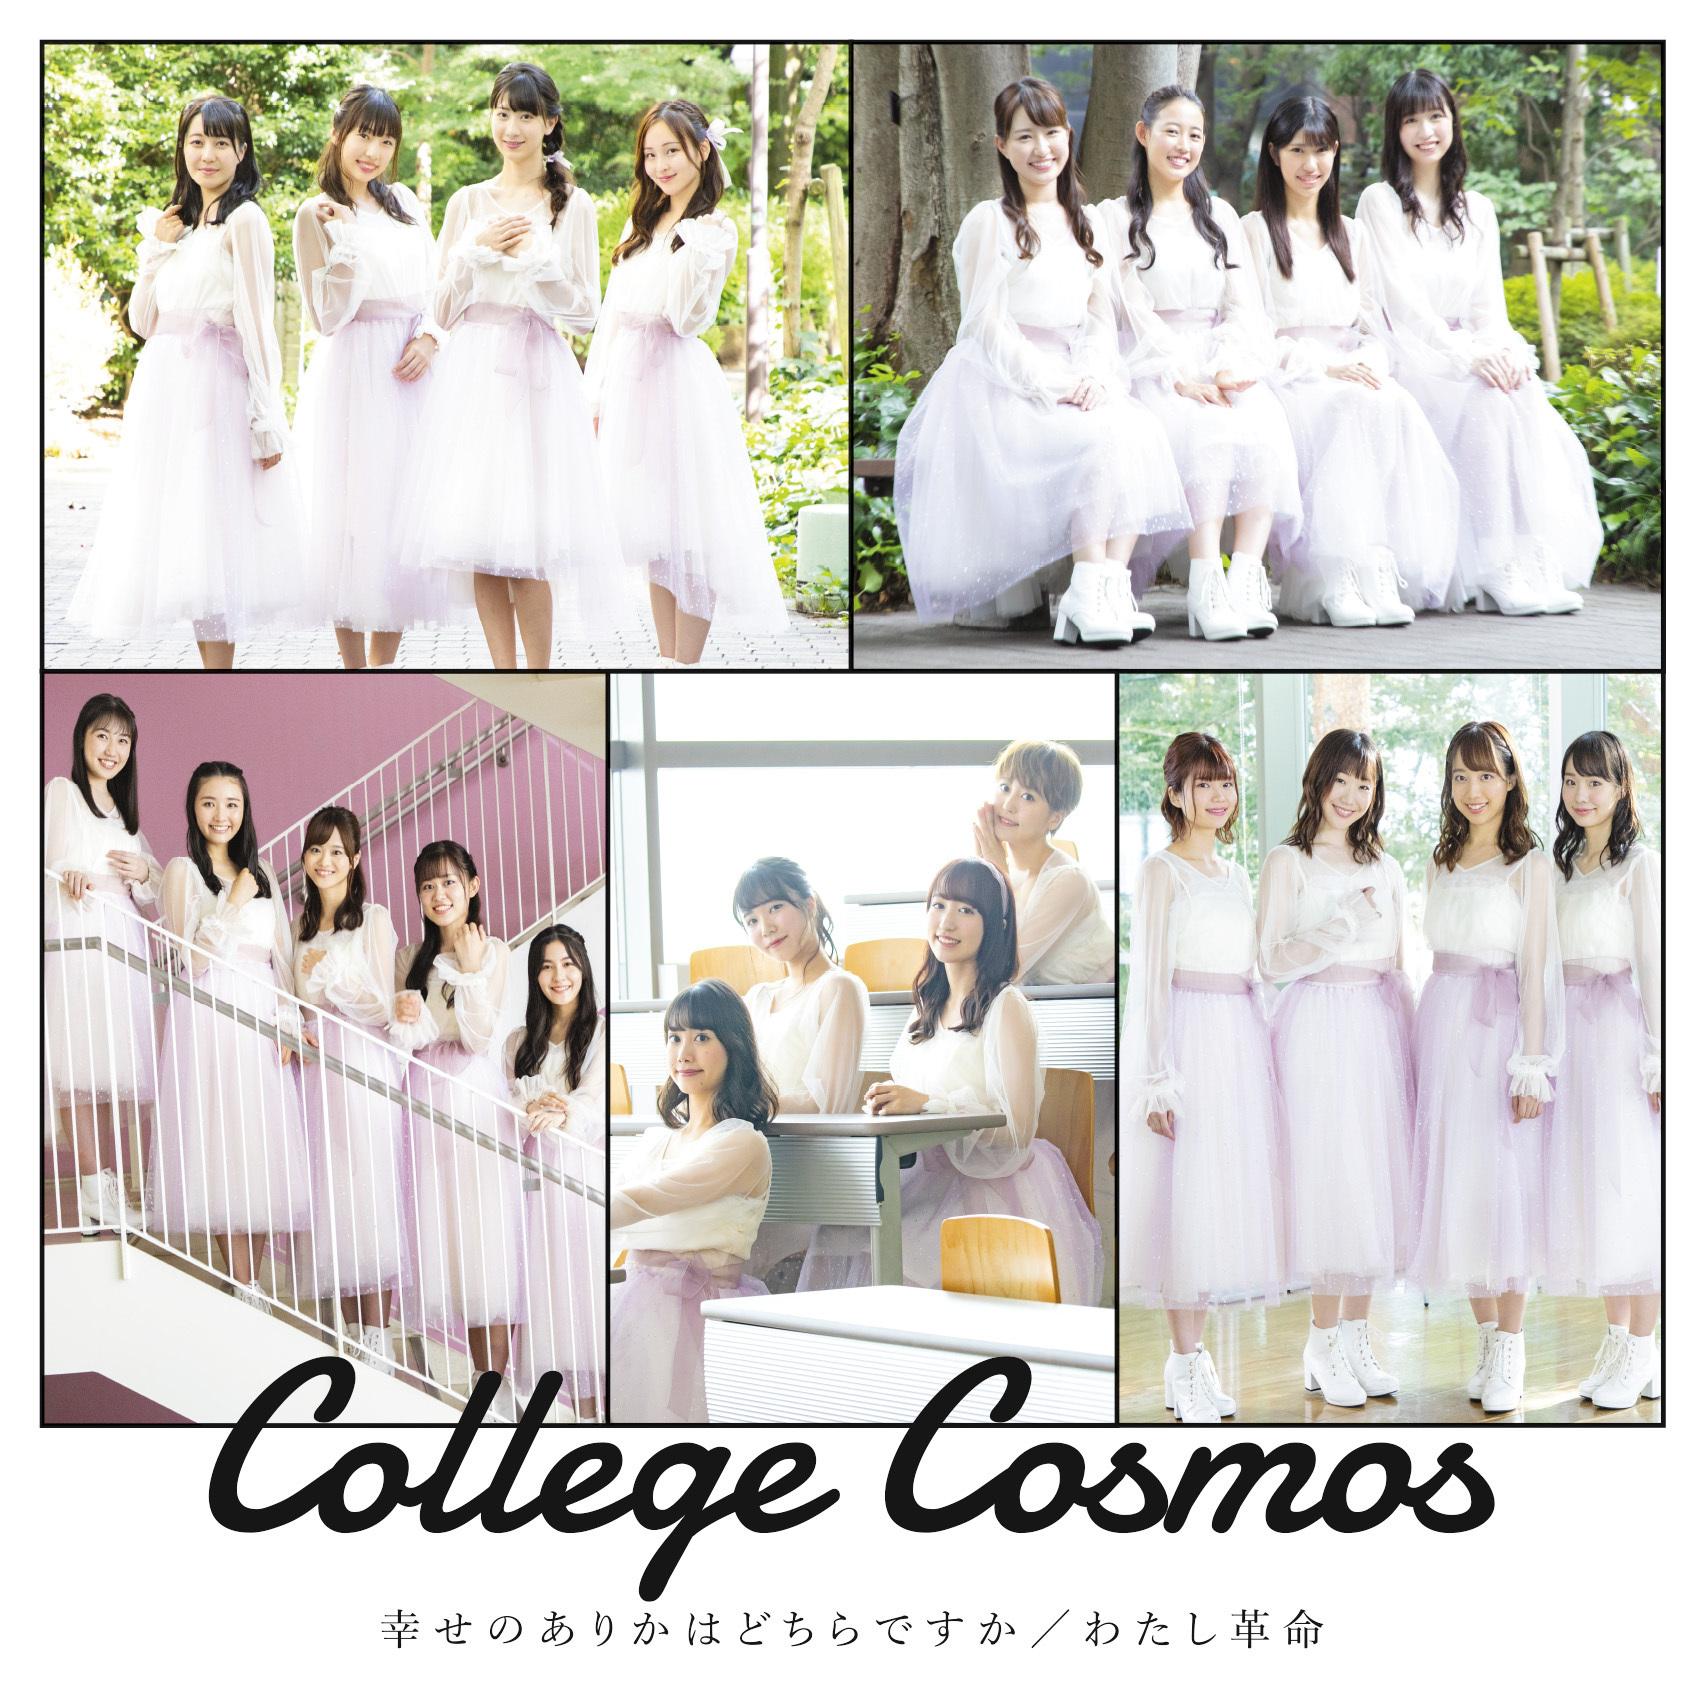 collegecosmos.jp